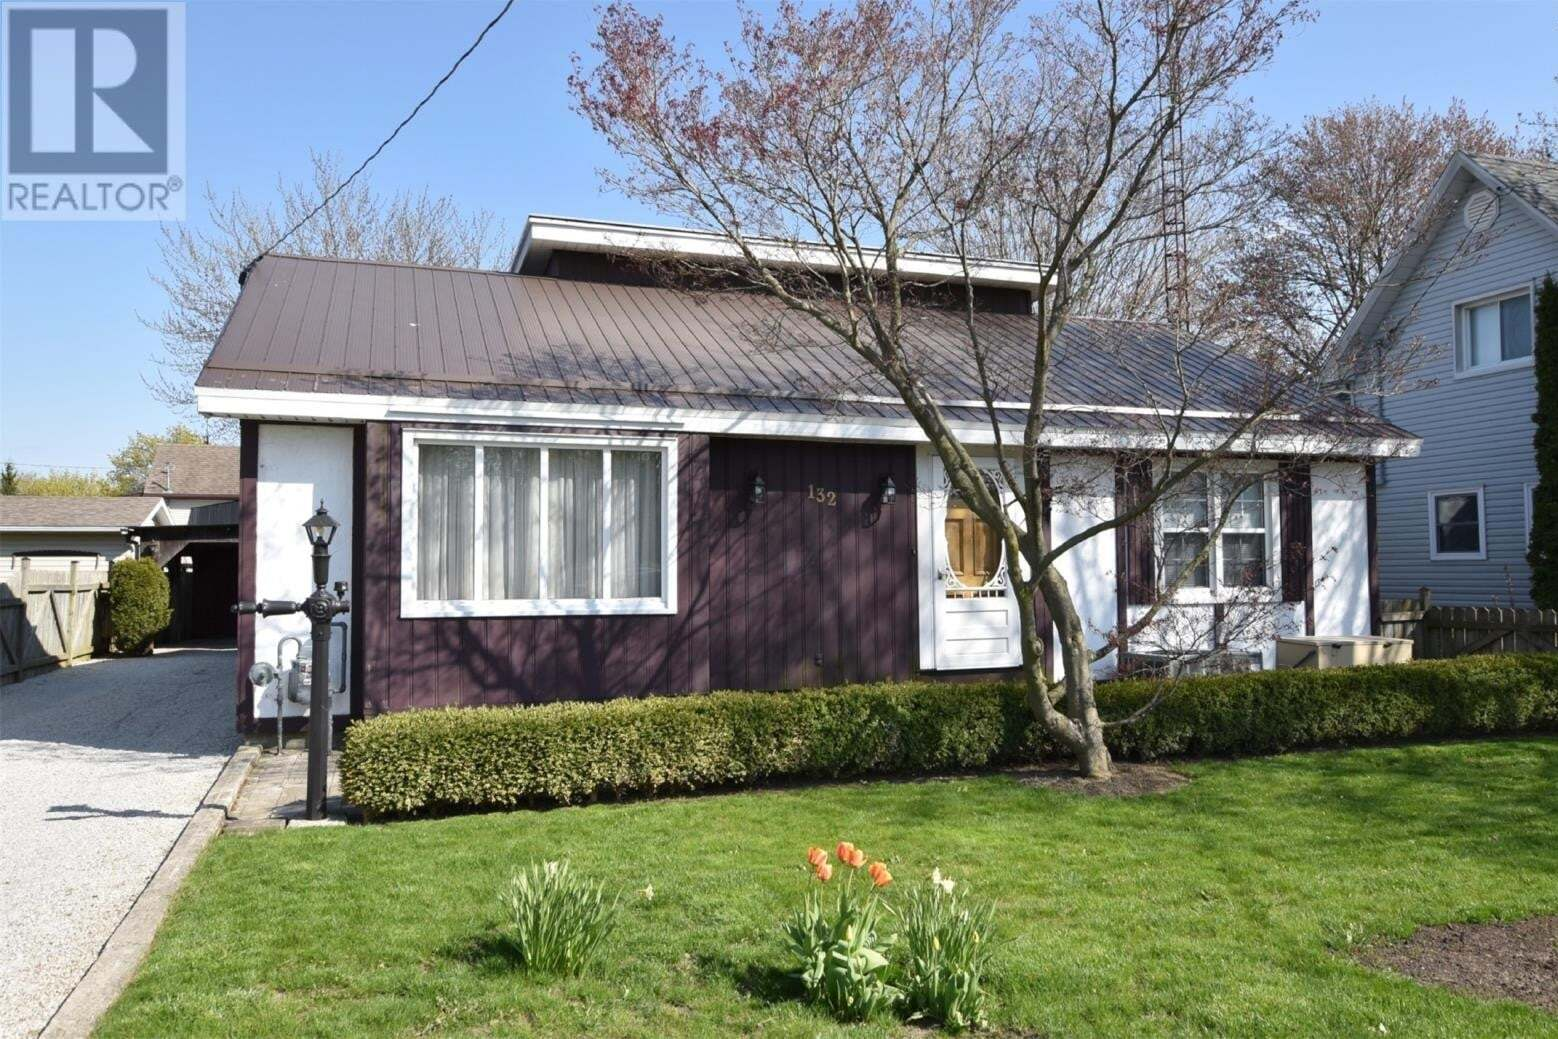 House for sale at 132 Catherine Street  Blenheim Ontario - MLS: 20005935